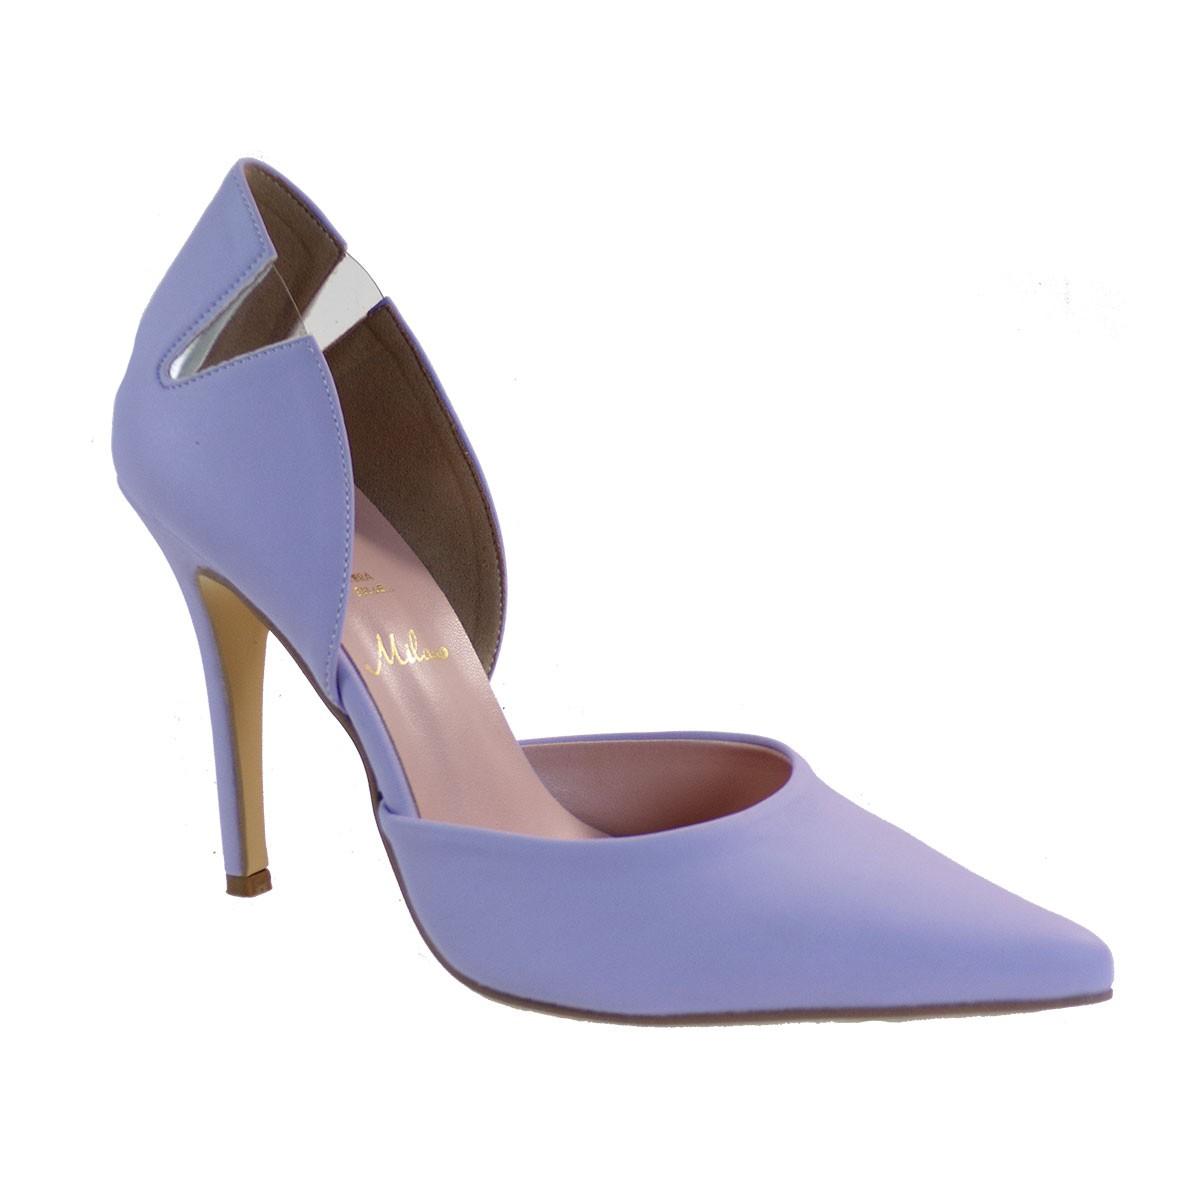 Alessandra Paggioti Γυναικεία Παπούτσια Γόβες 89800 Μωβ Mατ